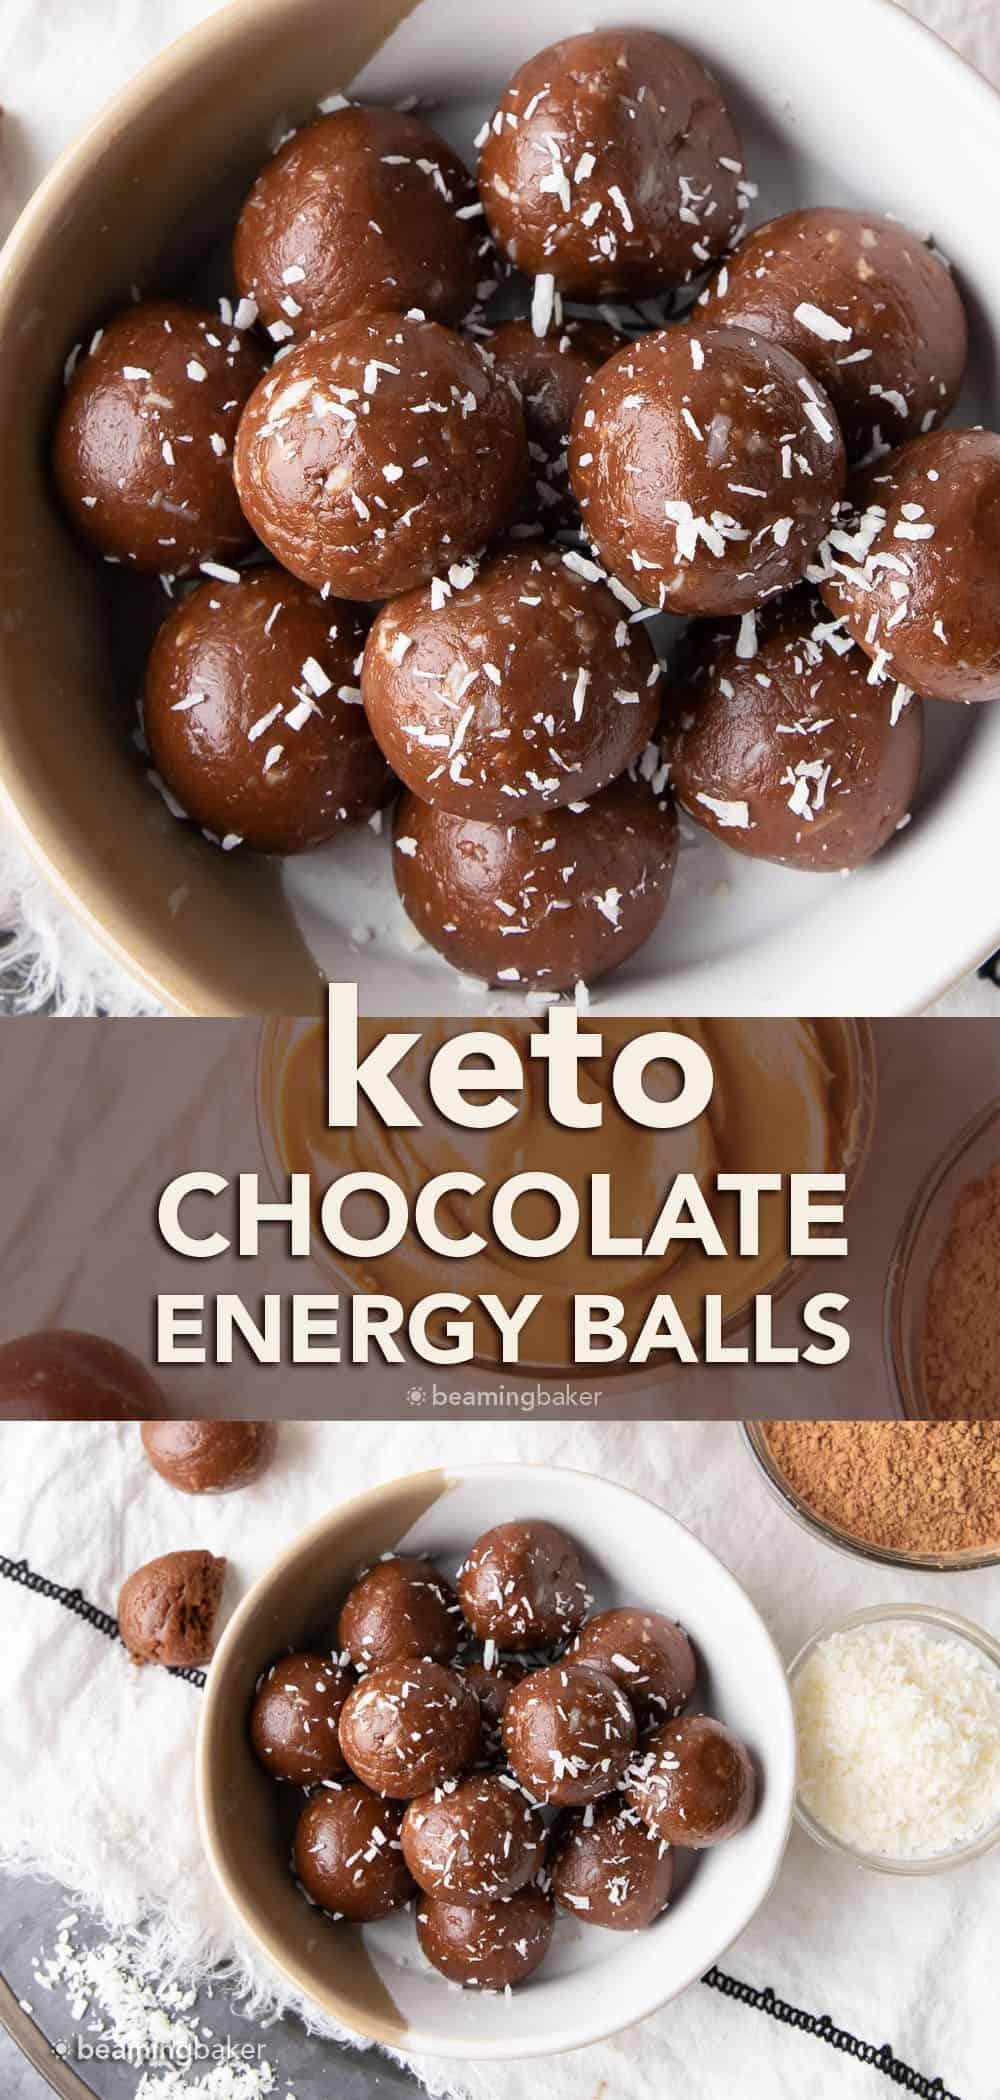 4 Ingredient Keto Chocolate Energy Balls: only 4 ingredients for delicious keto chocolate energy balls. The yummiest keto energy balls! #Keto #NoBake #LowCarb #Energy   Recipe at BeamingBaker.com